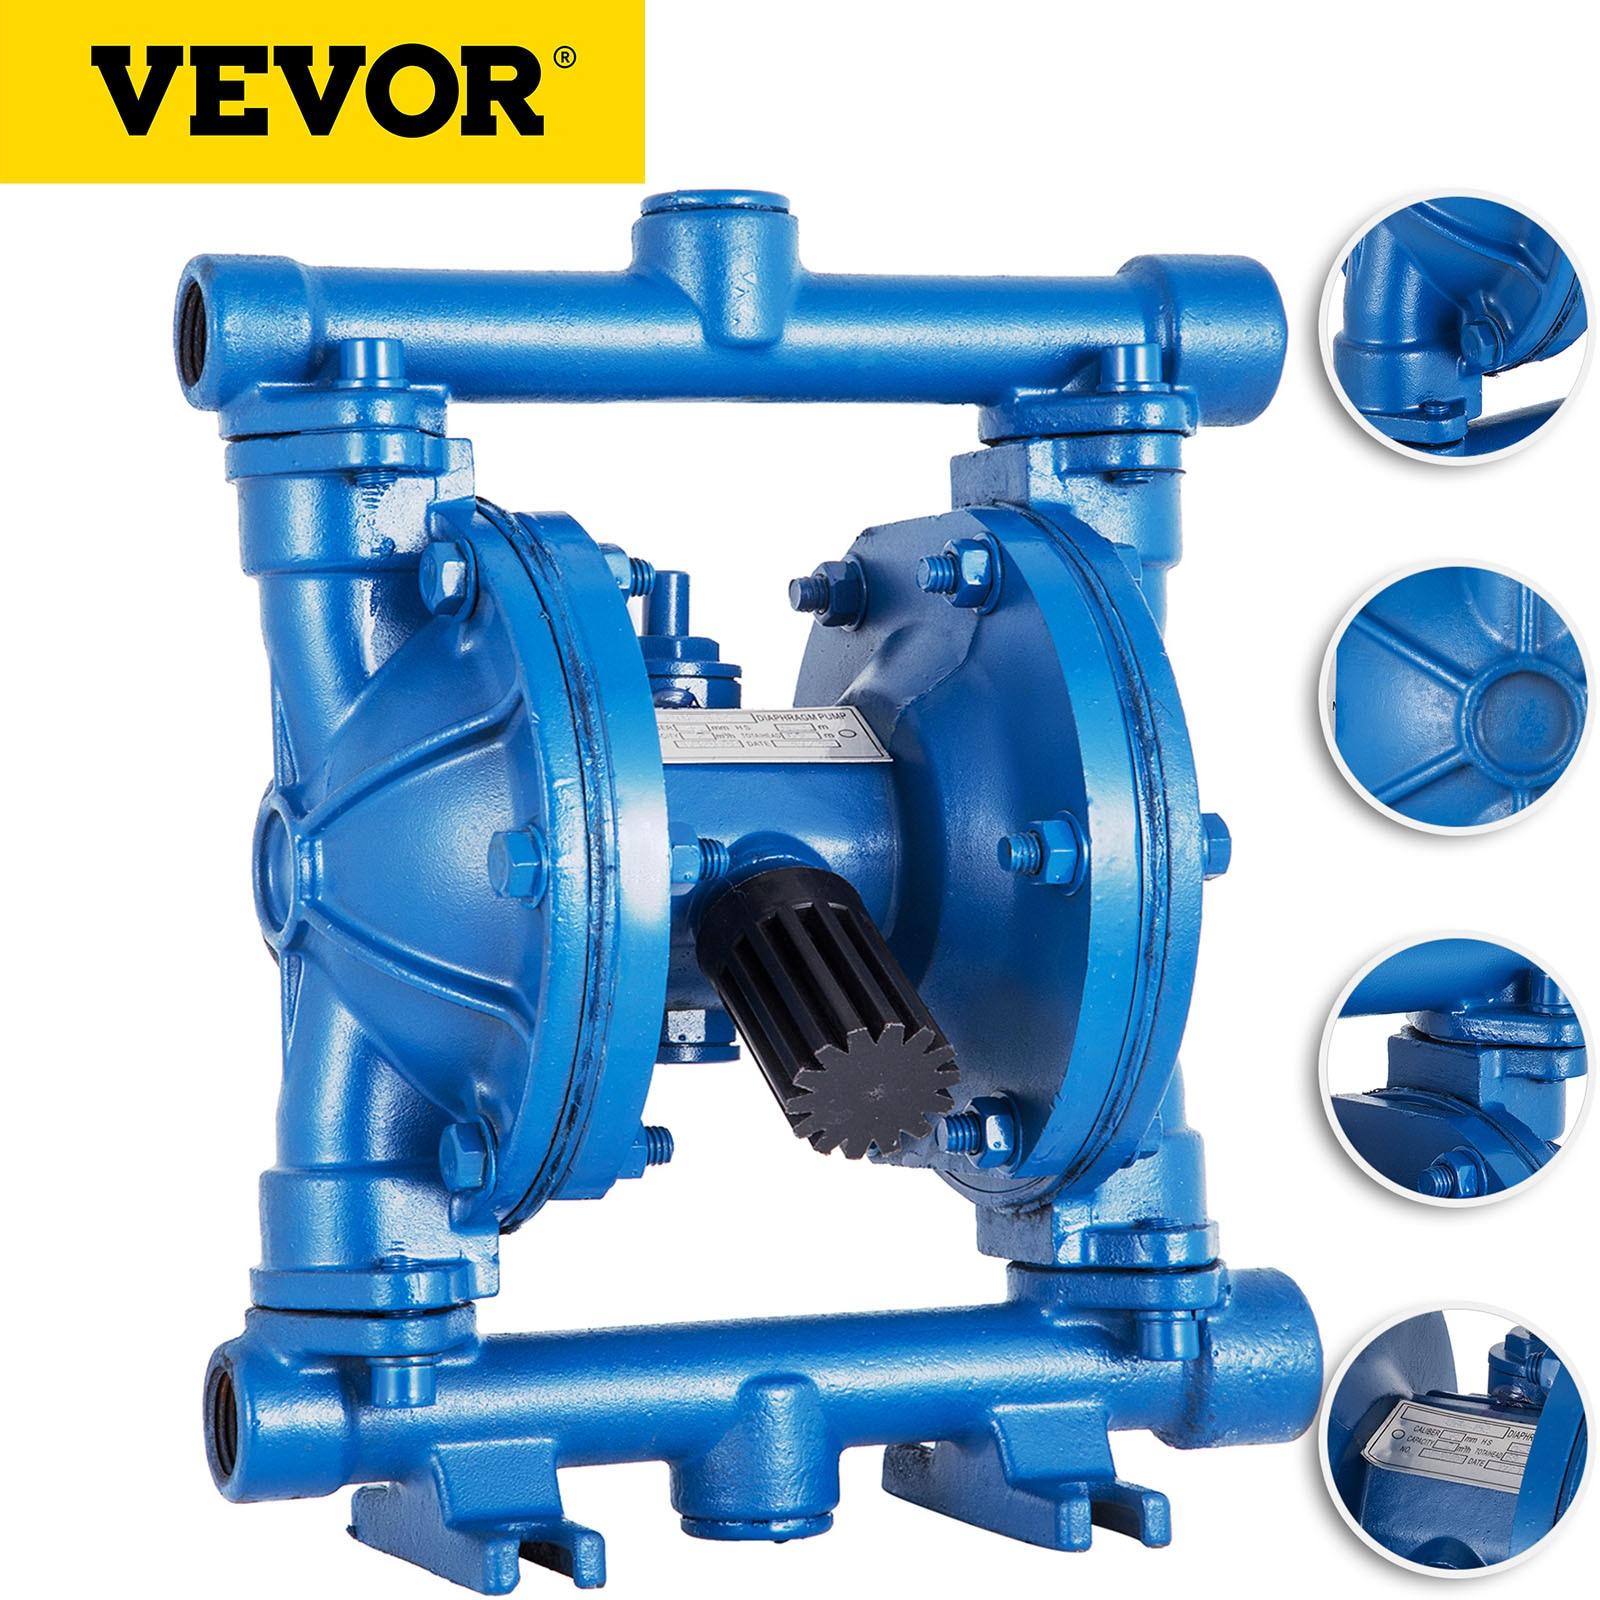 VEVOR تعمل بالهواء مضخة مزدوجة بحجاب حاجز 1/2in مدخل منفذ منخفض اللزوجة النفط السوائل مضخة هواء غشائية الحديد الزهر 12 GPB